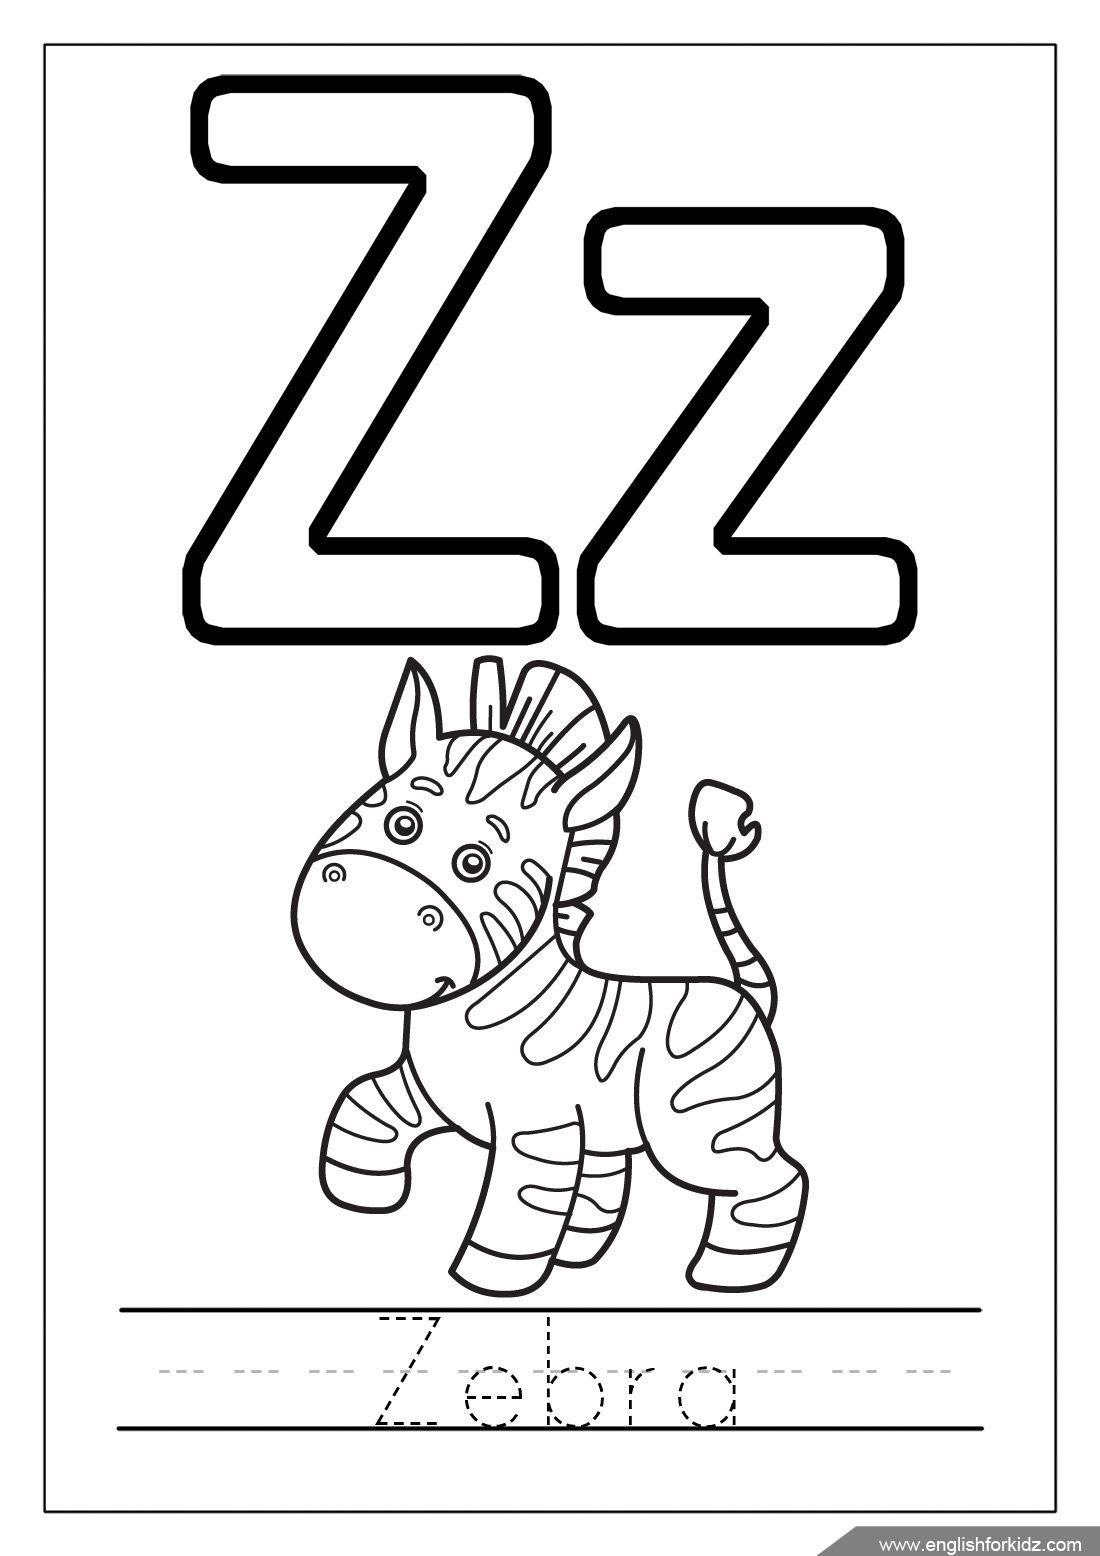 Alphabet Coloring Page Letter Z Coloring Zebra Coloring Letter